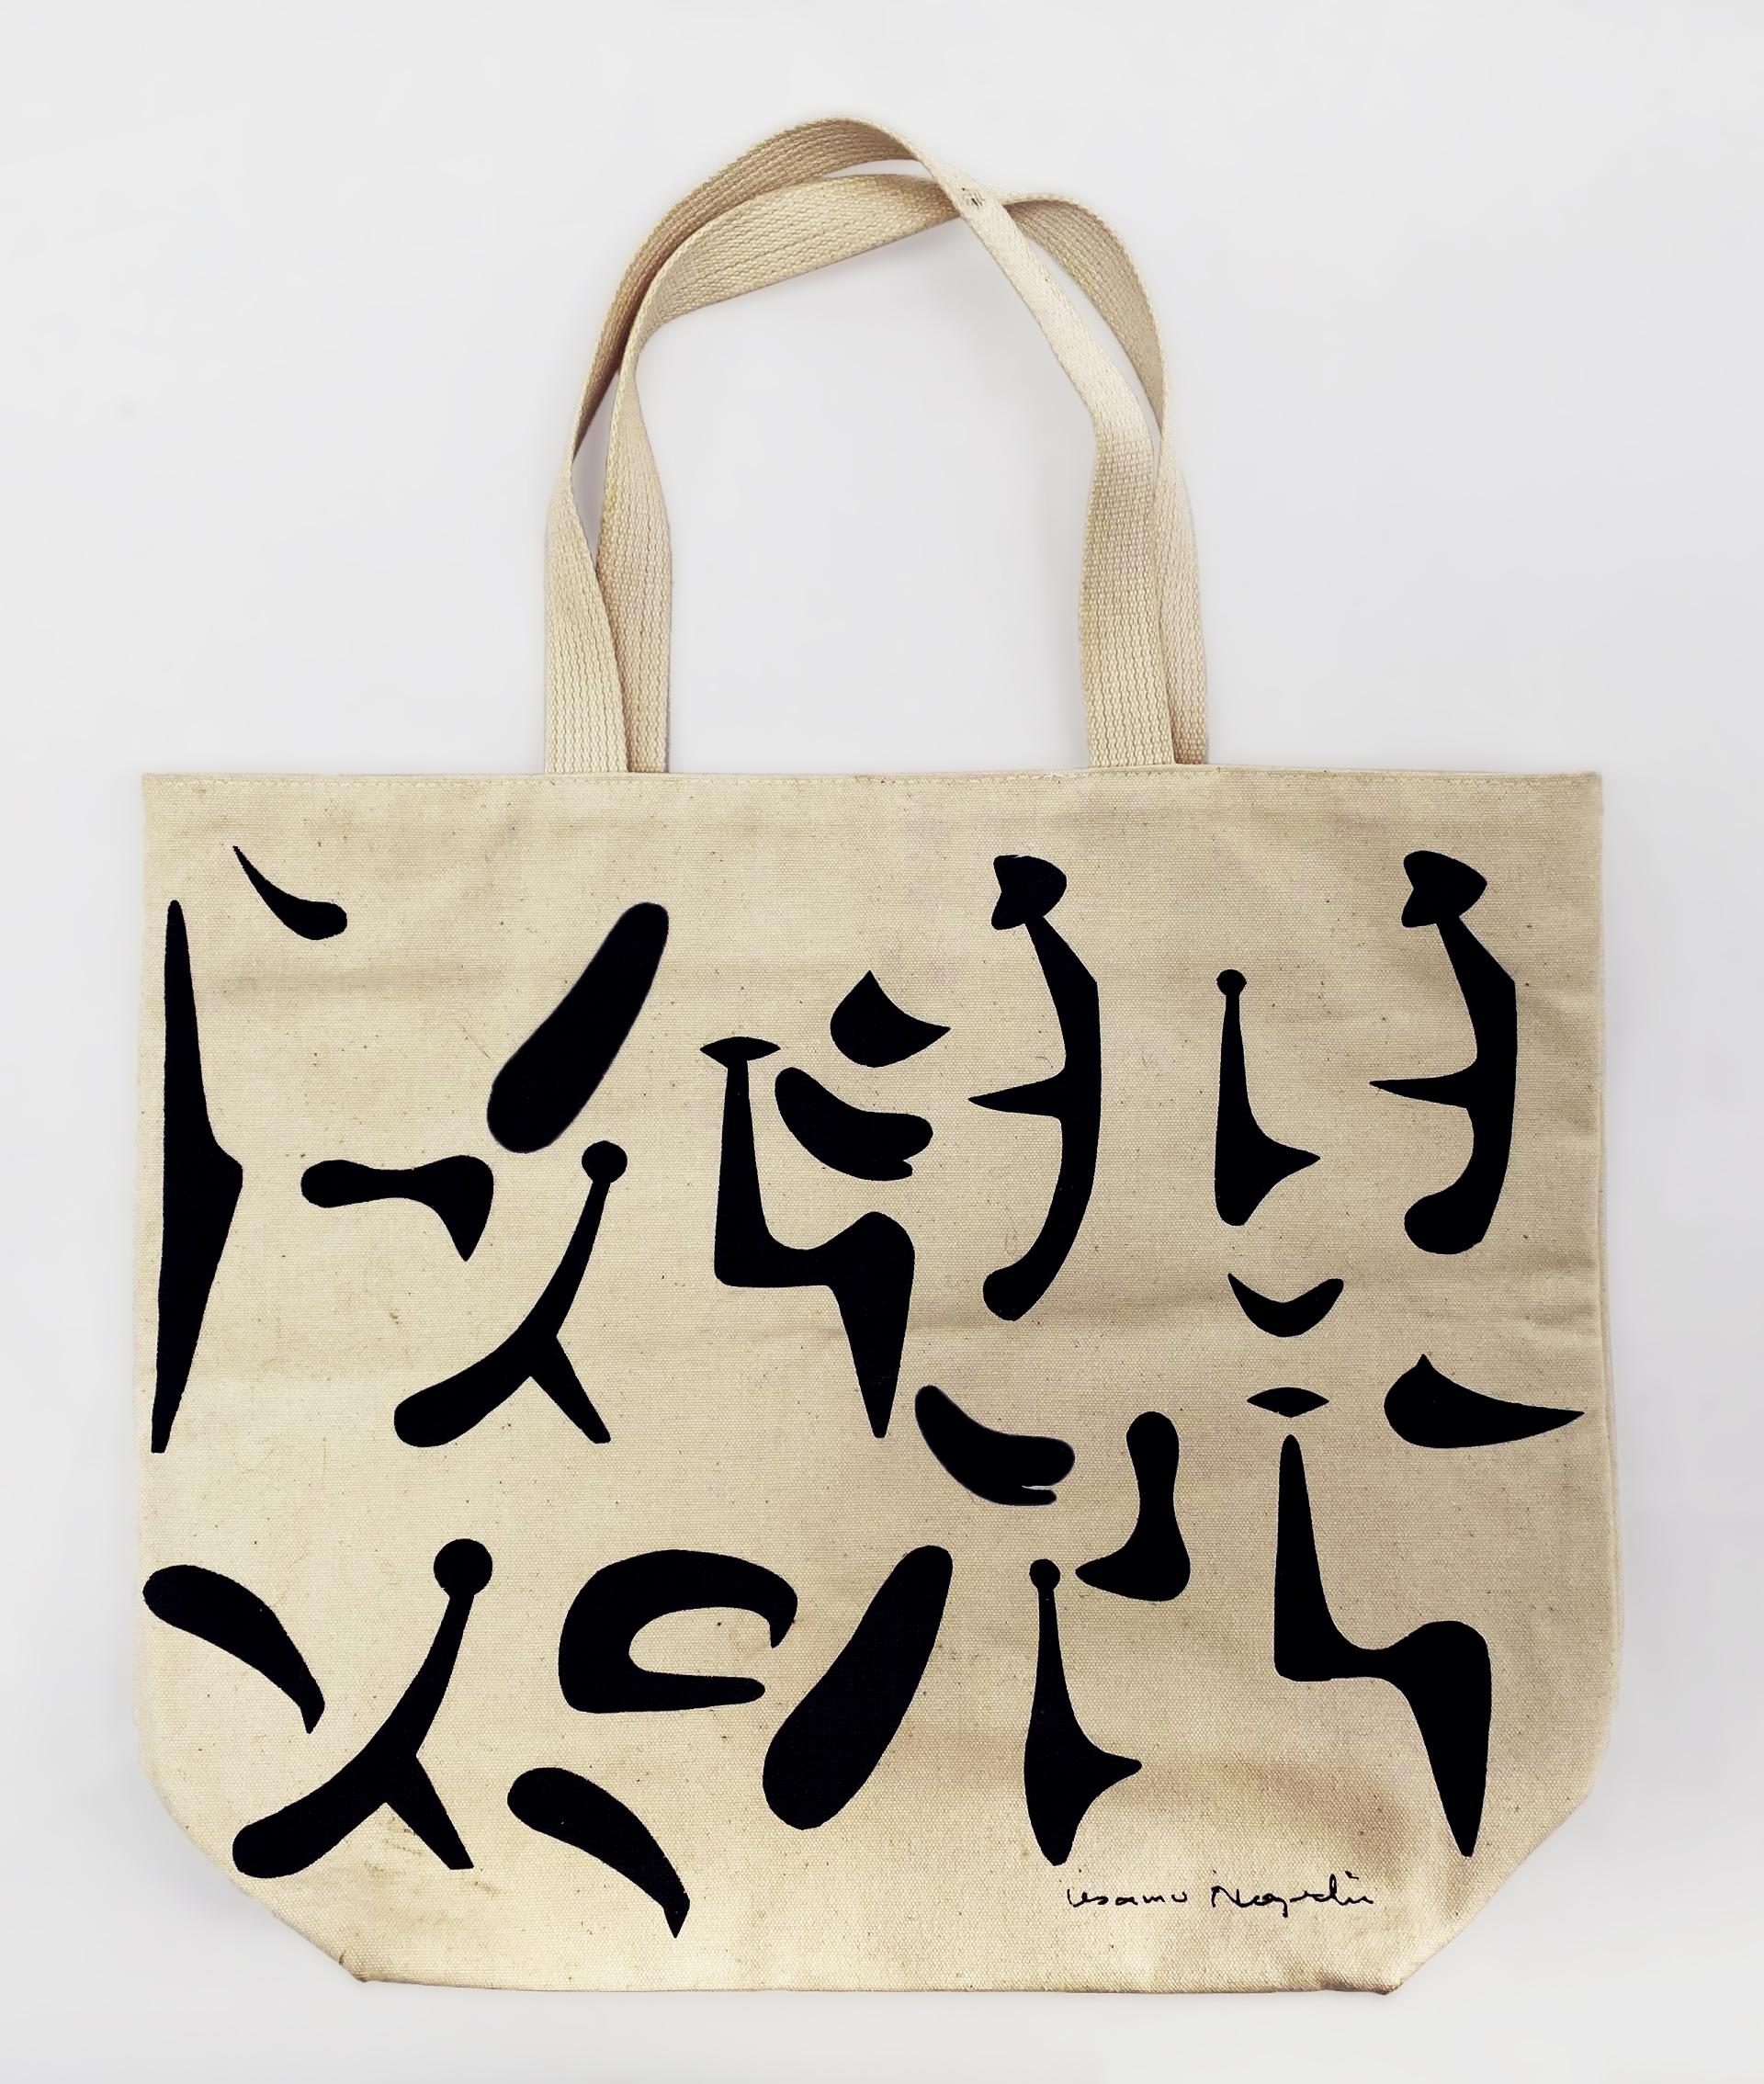 YSP Noguchi tote bag